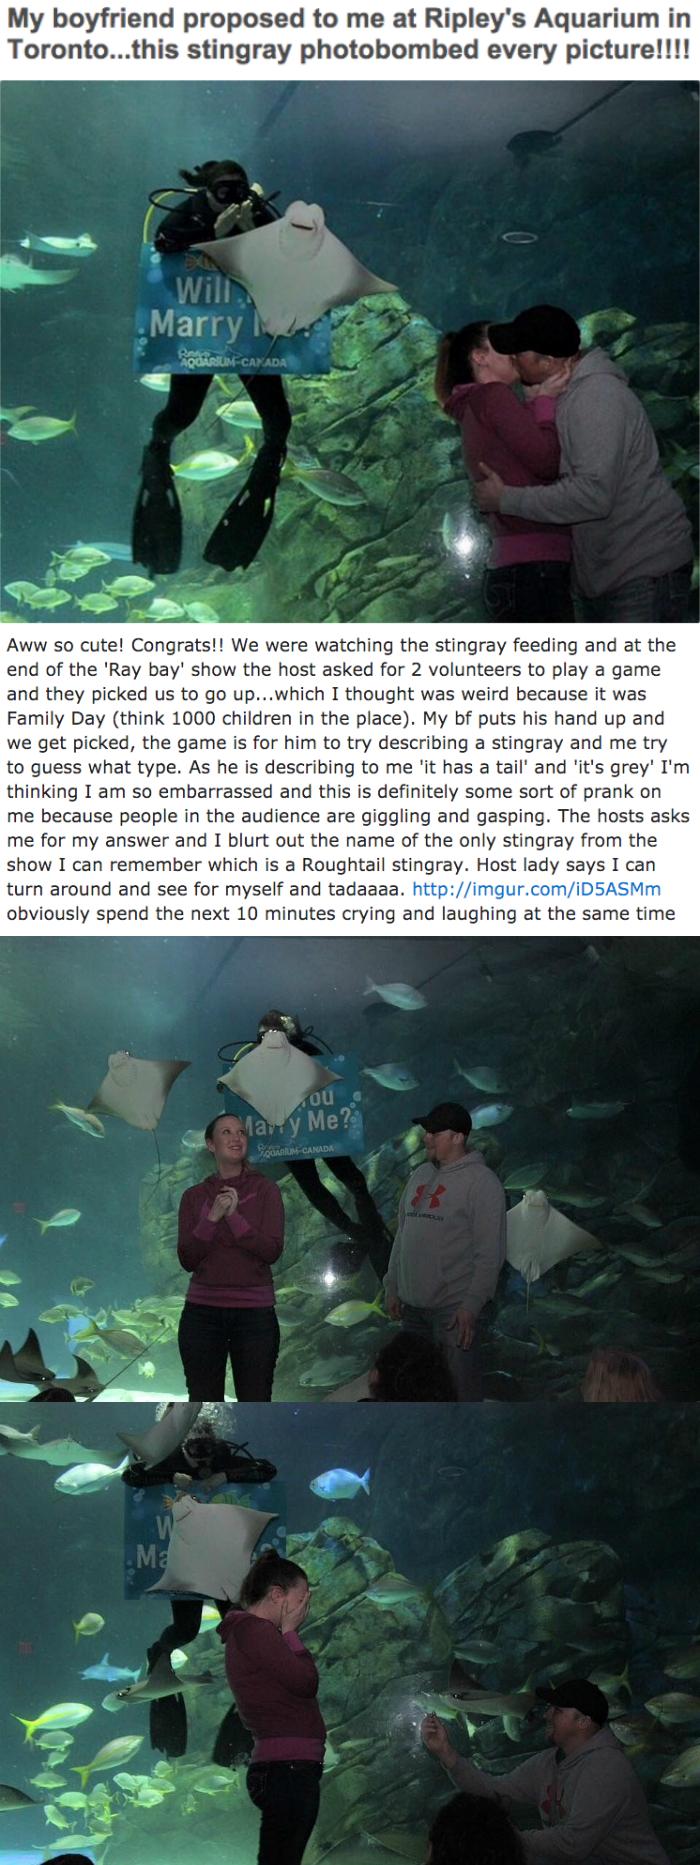 funny dating image stingray photobombs engagement proposal at aquarium